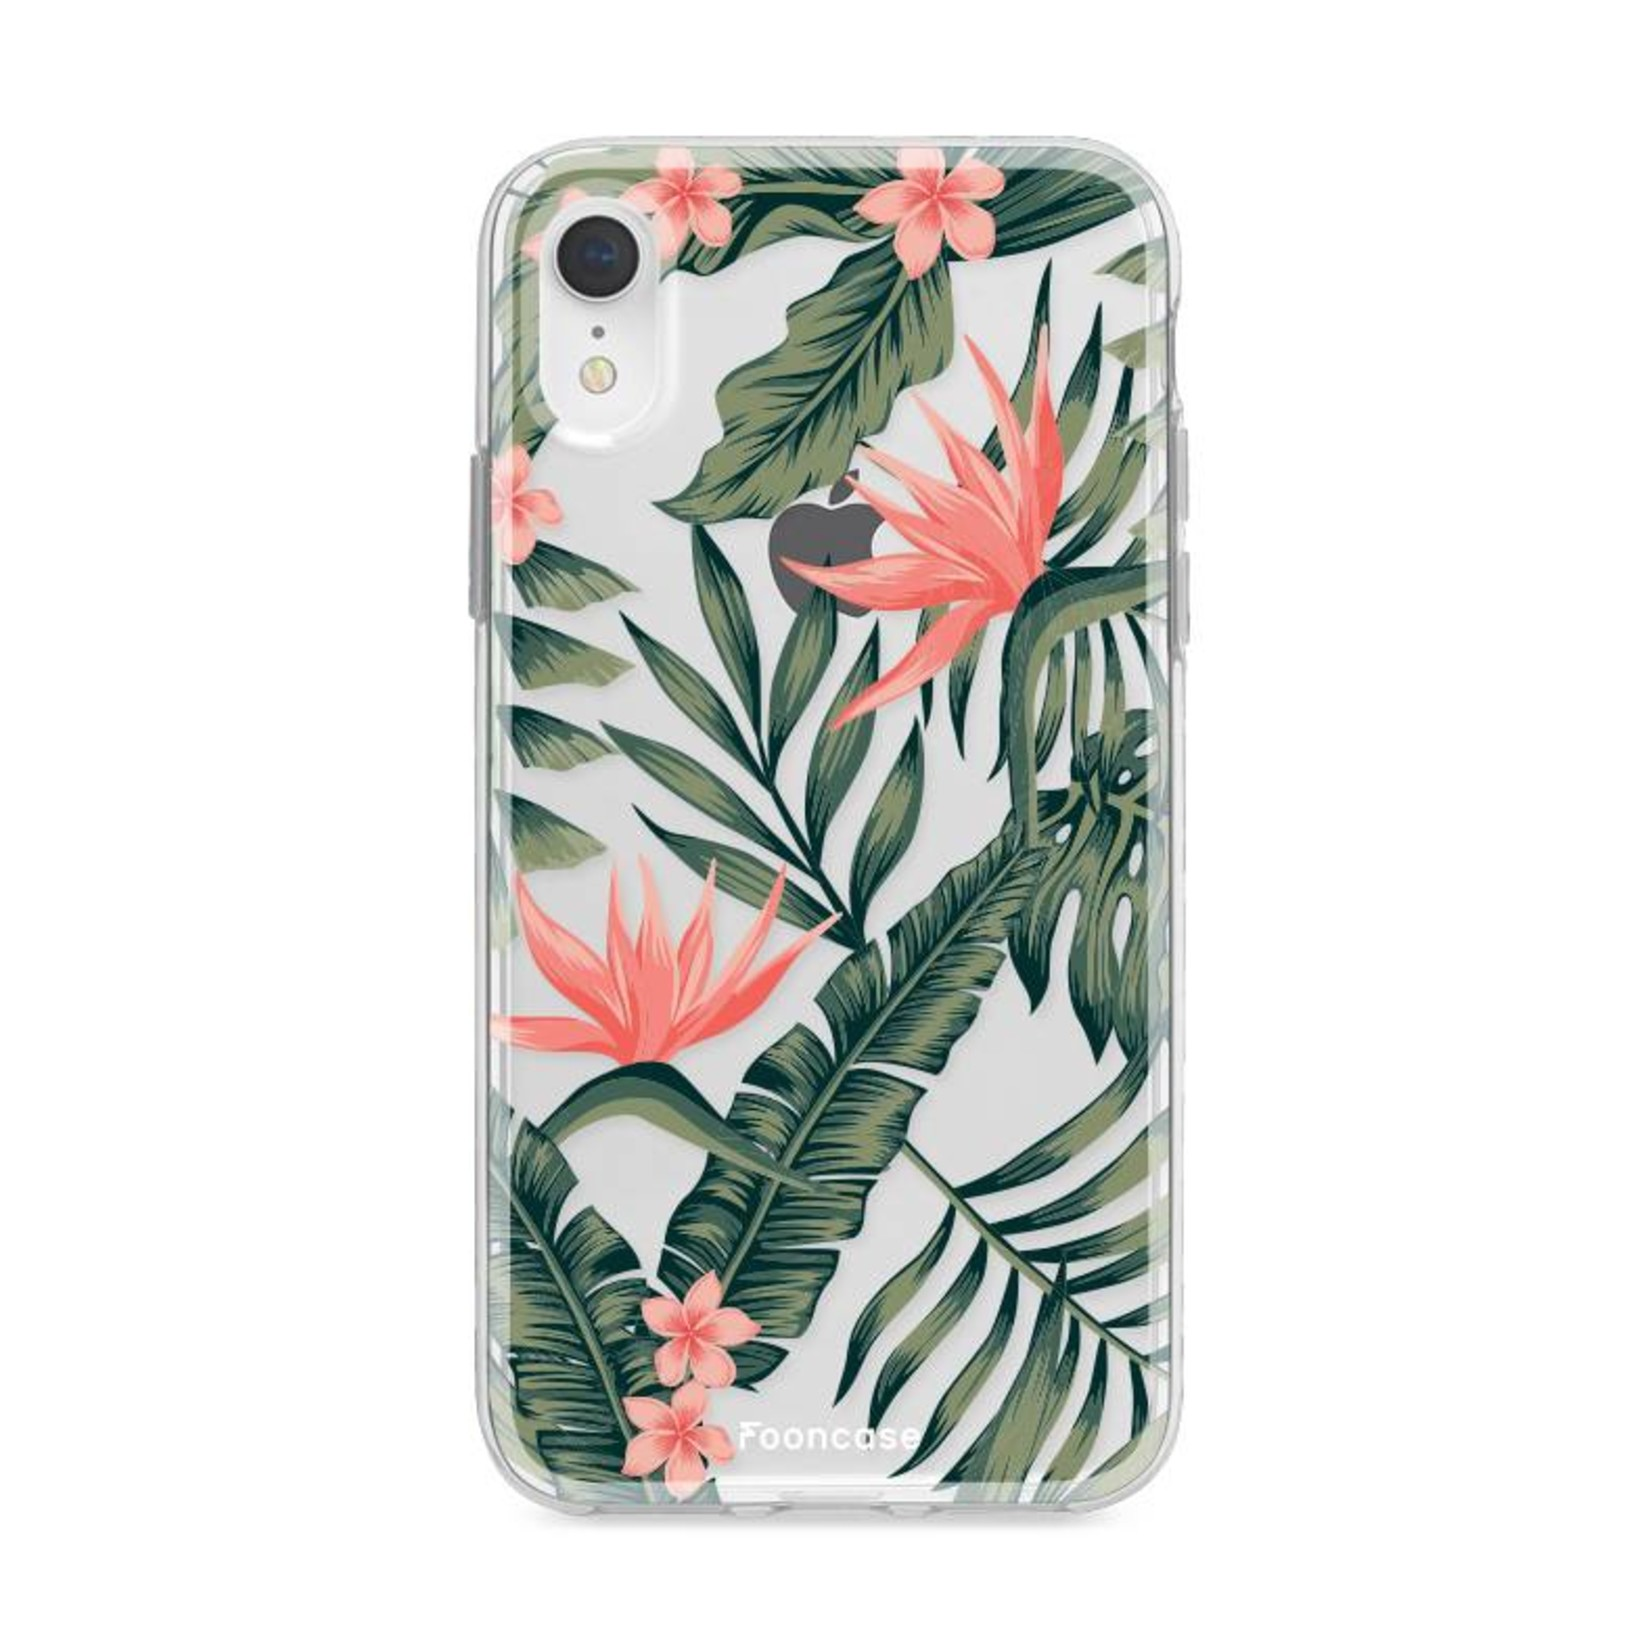 FOONCASE iPhone XR hoesje TPU Soft Case - Back Cover - Tropical Desire / Bladeren / Roze